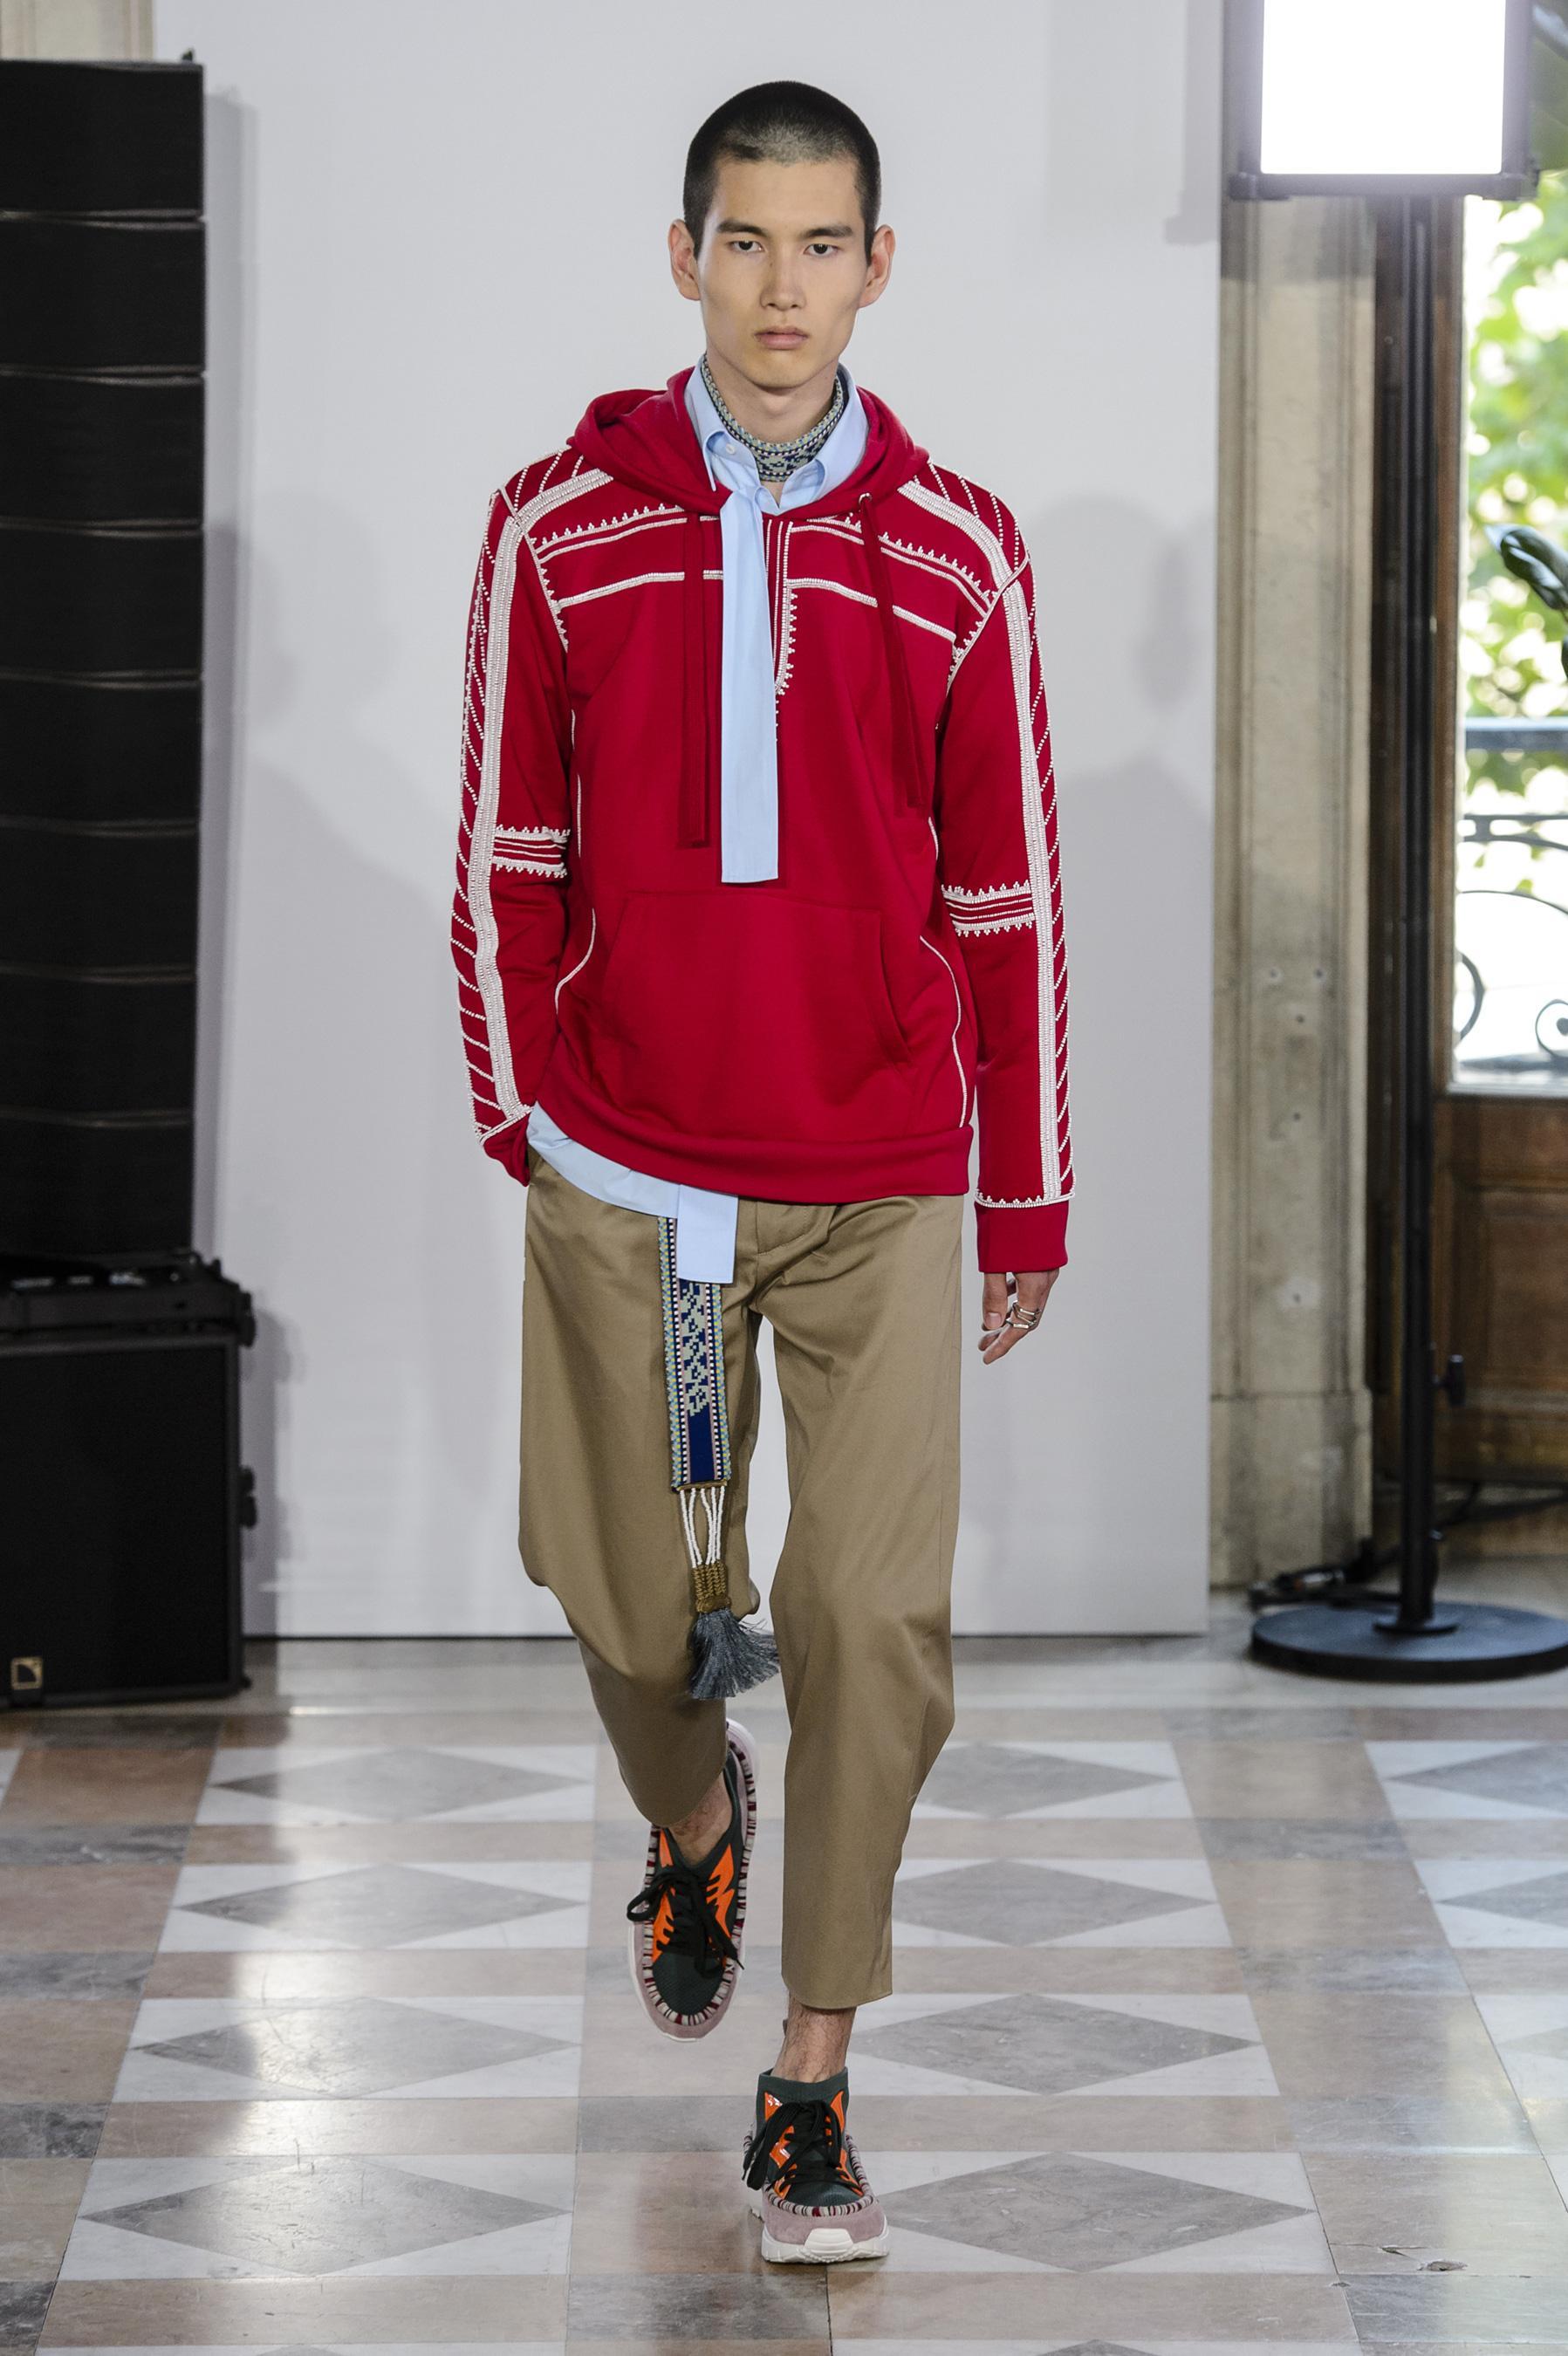 Défilé Valentino printemps-été 2018, Paris - Look 6. Défilé Valentino Homme  Printemps-été 2018 Paris - photo 6 Imaxtree 8770e6fa863